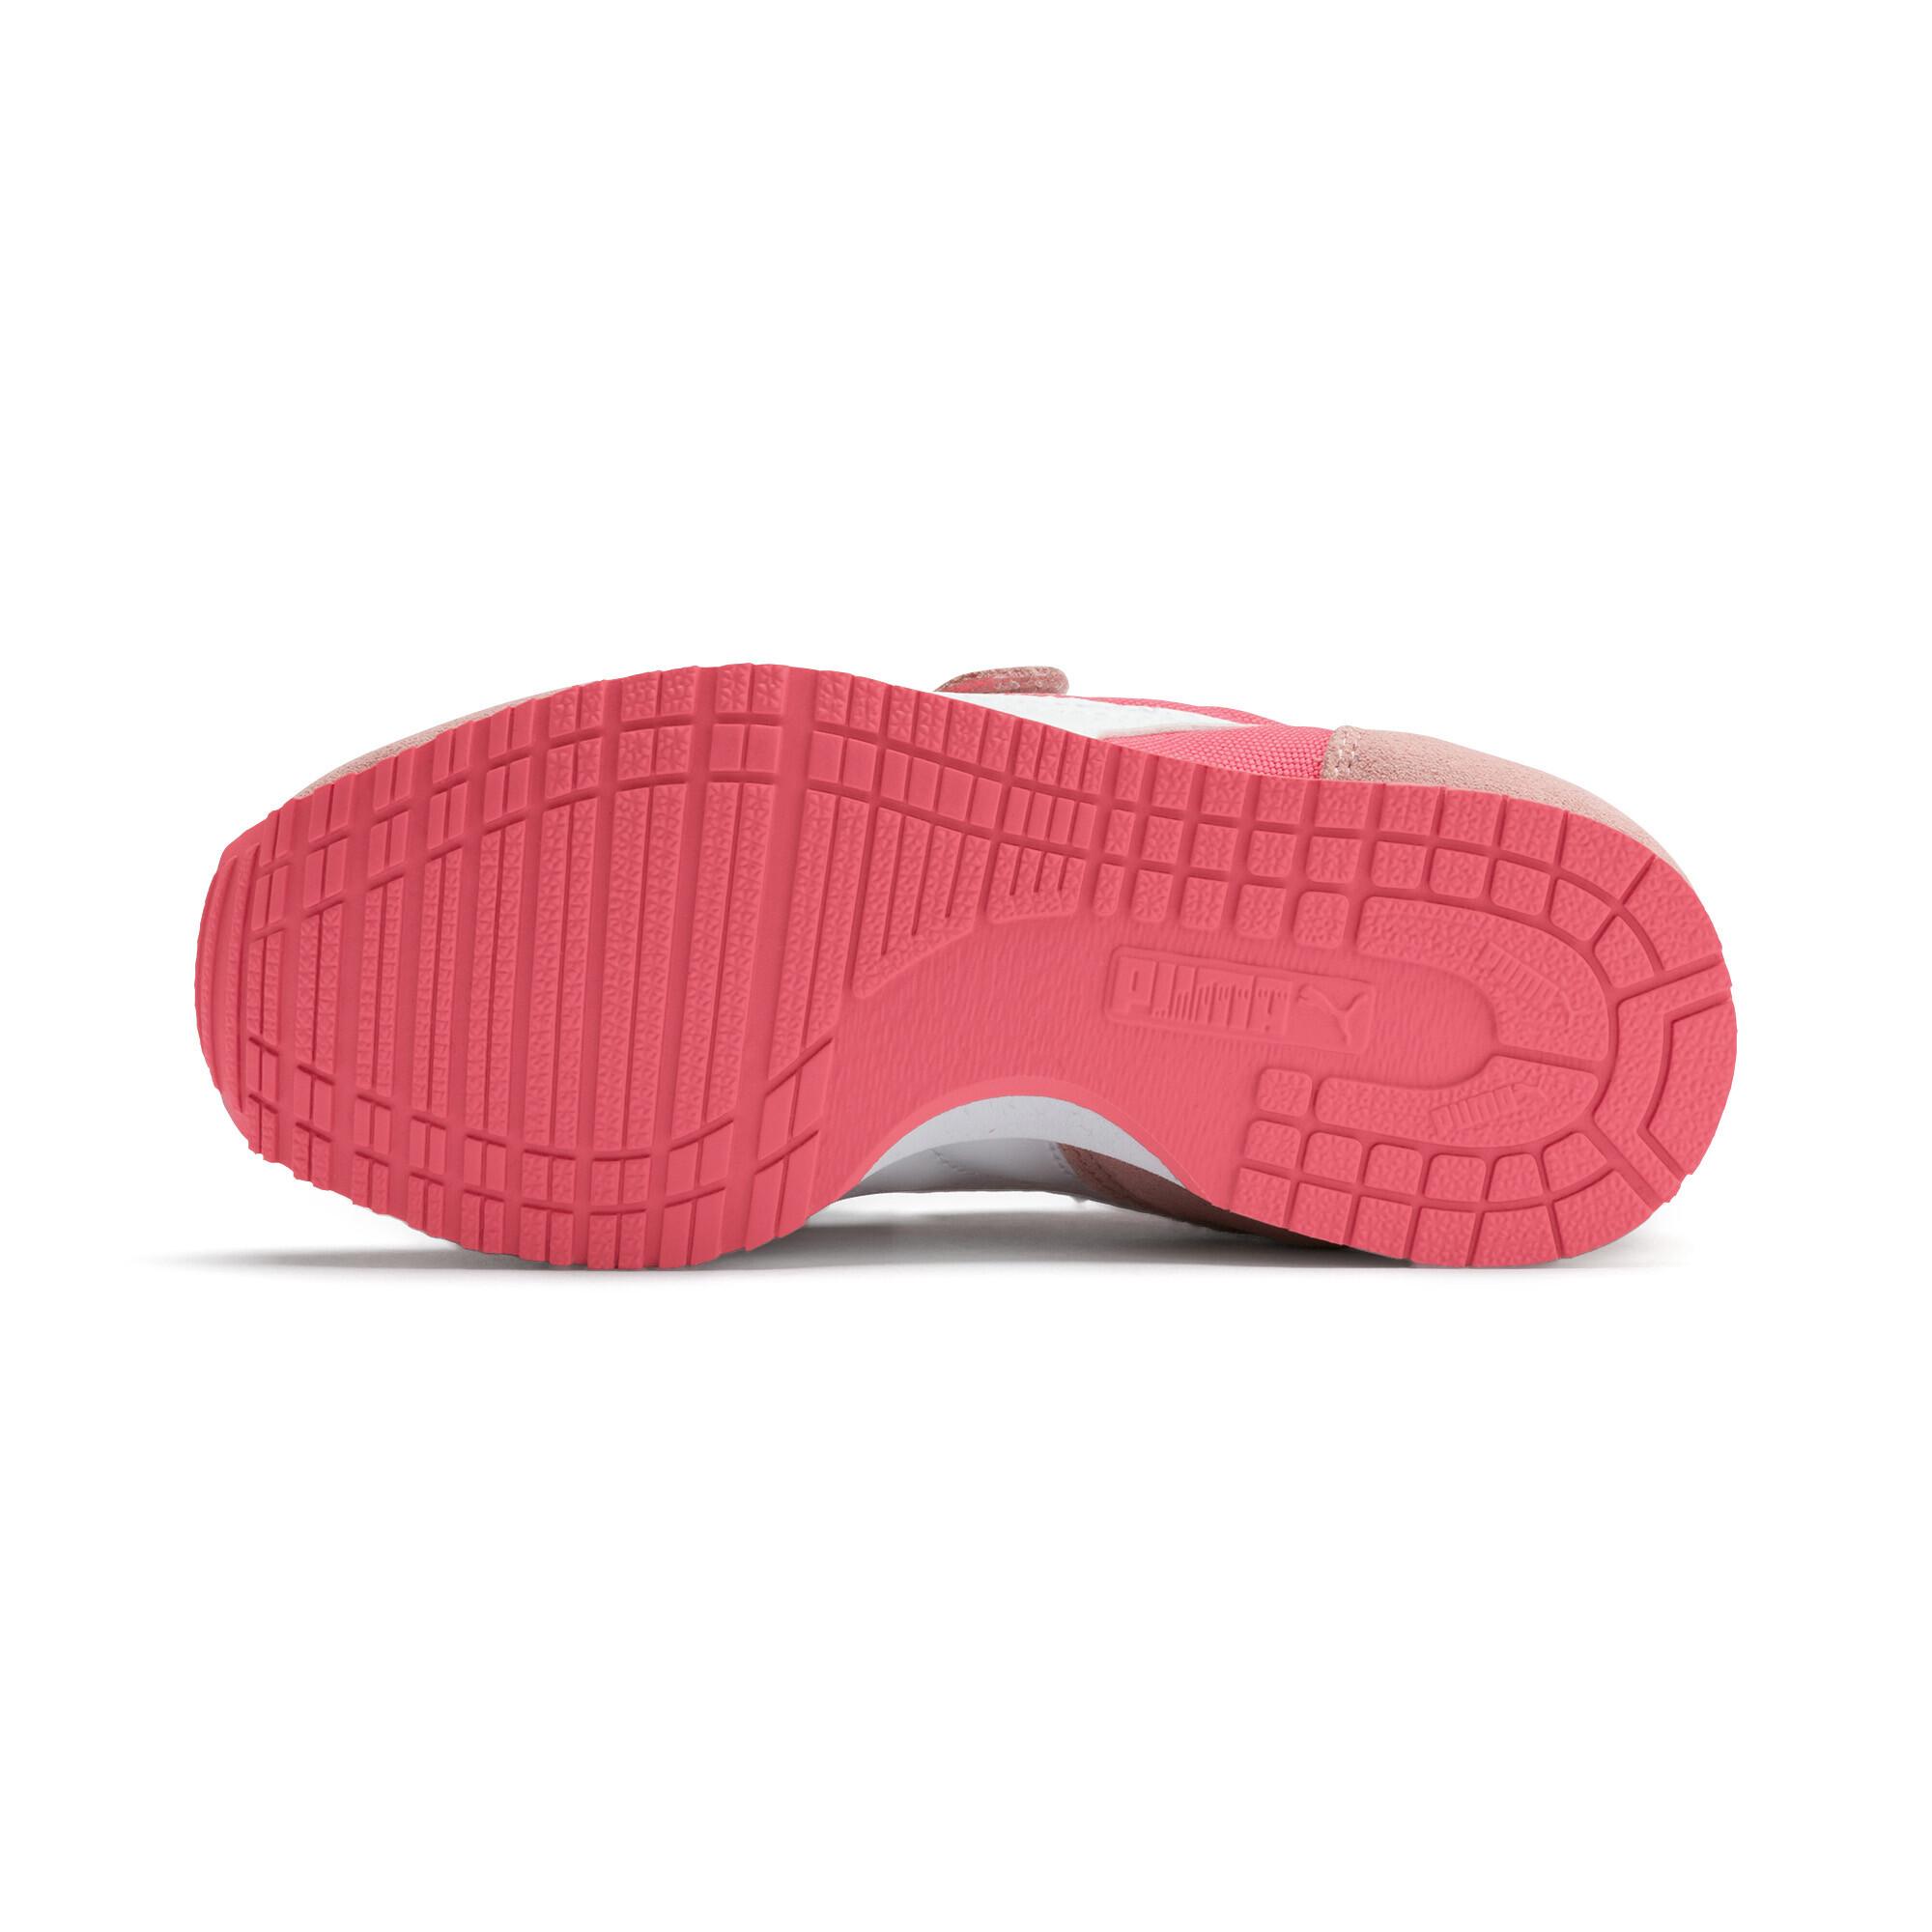 PUMA-Cabana-Racer-Little-Kids-039-Shoes-Kids-Shoe-Kids thumbnail 16